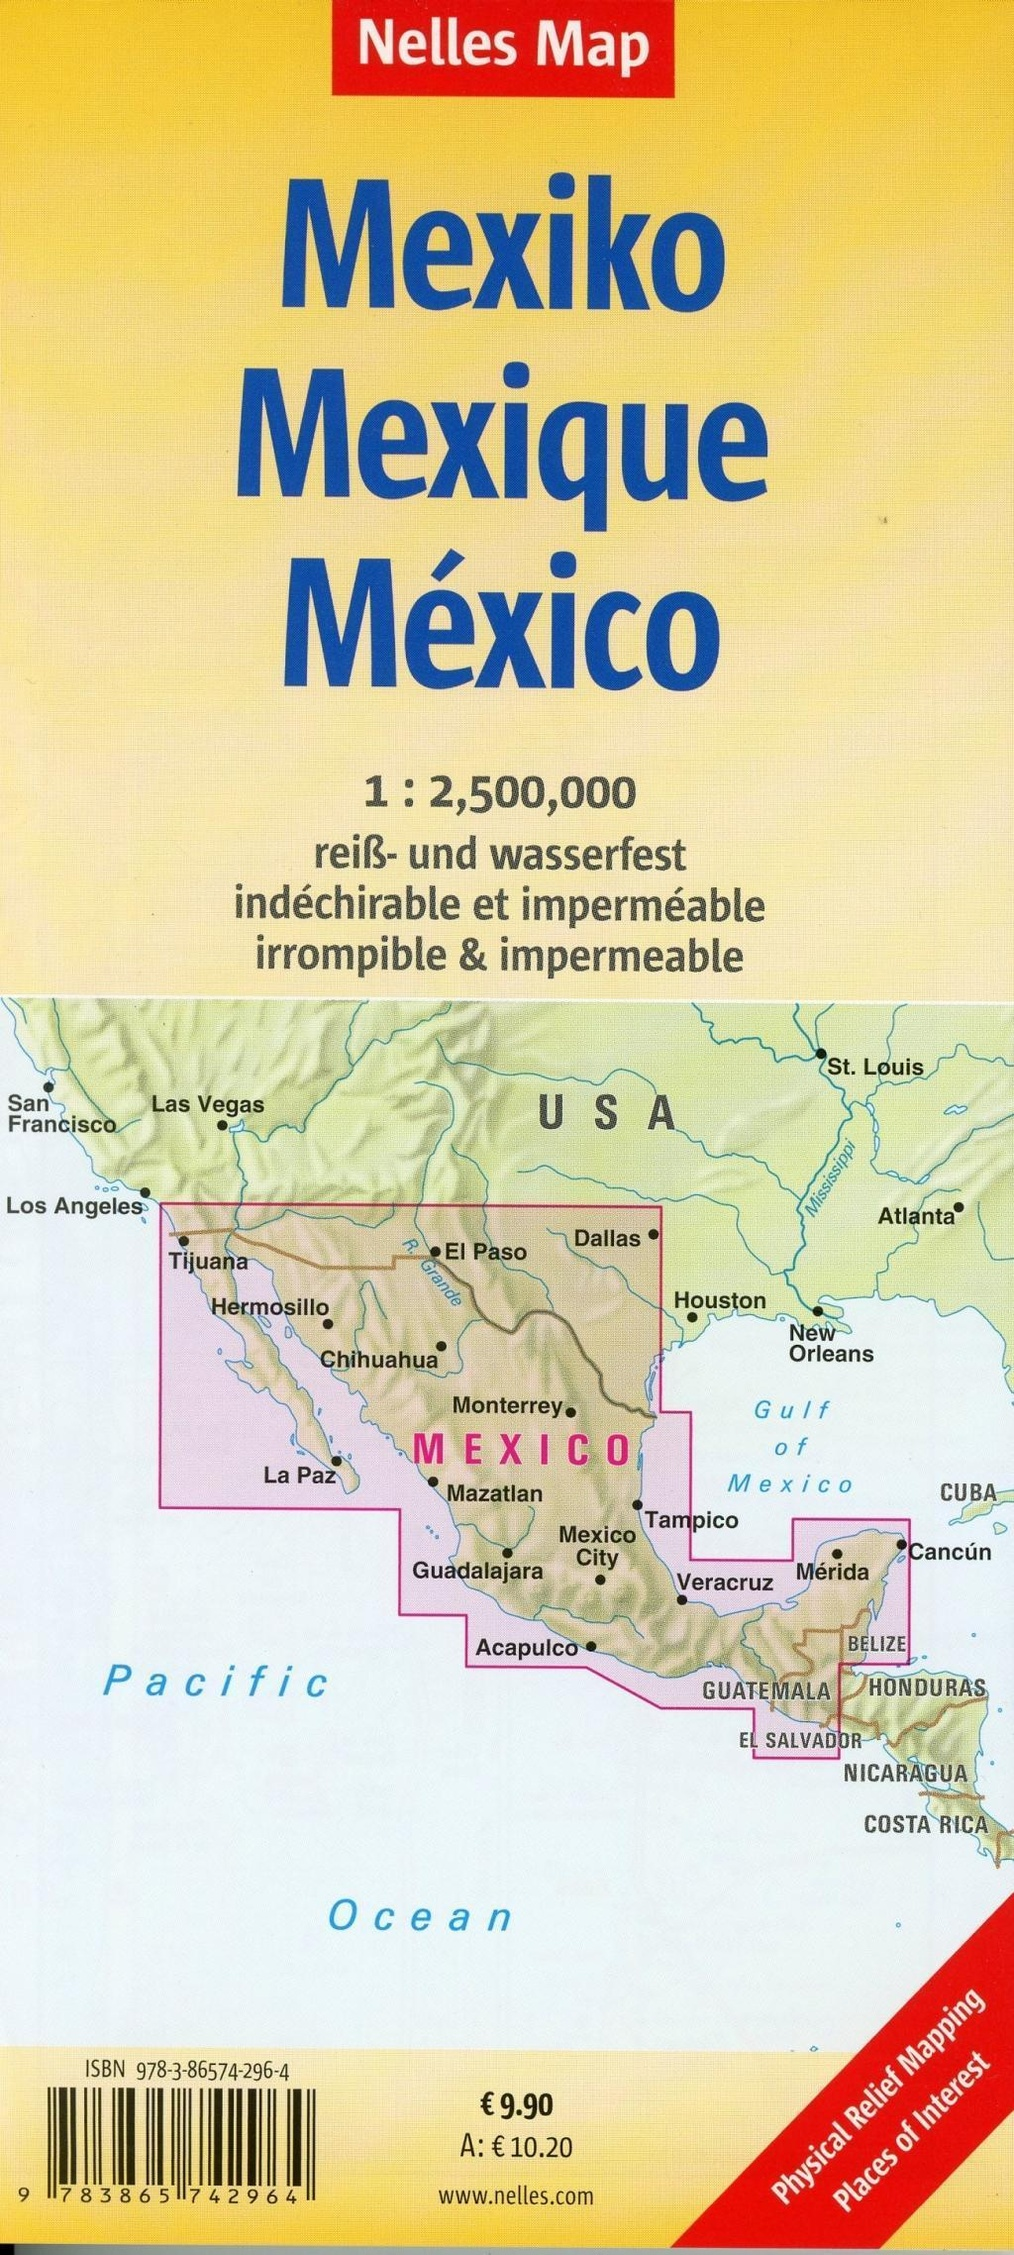 Nelles Map Landkarte Mexico Buch Bei Weltbild Ch Online Bestellen